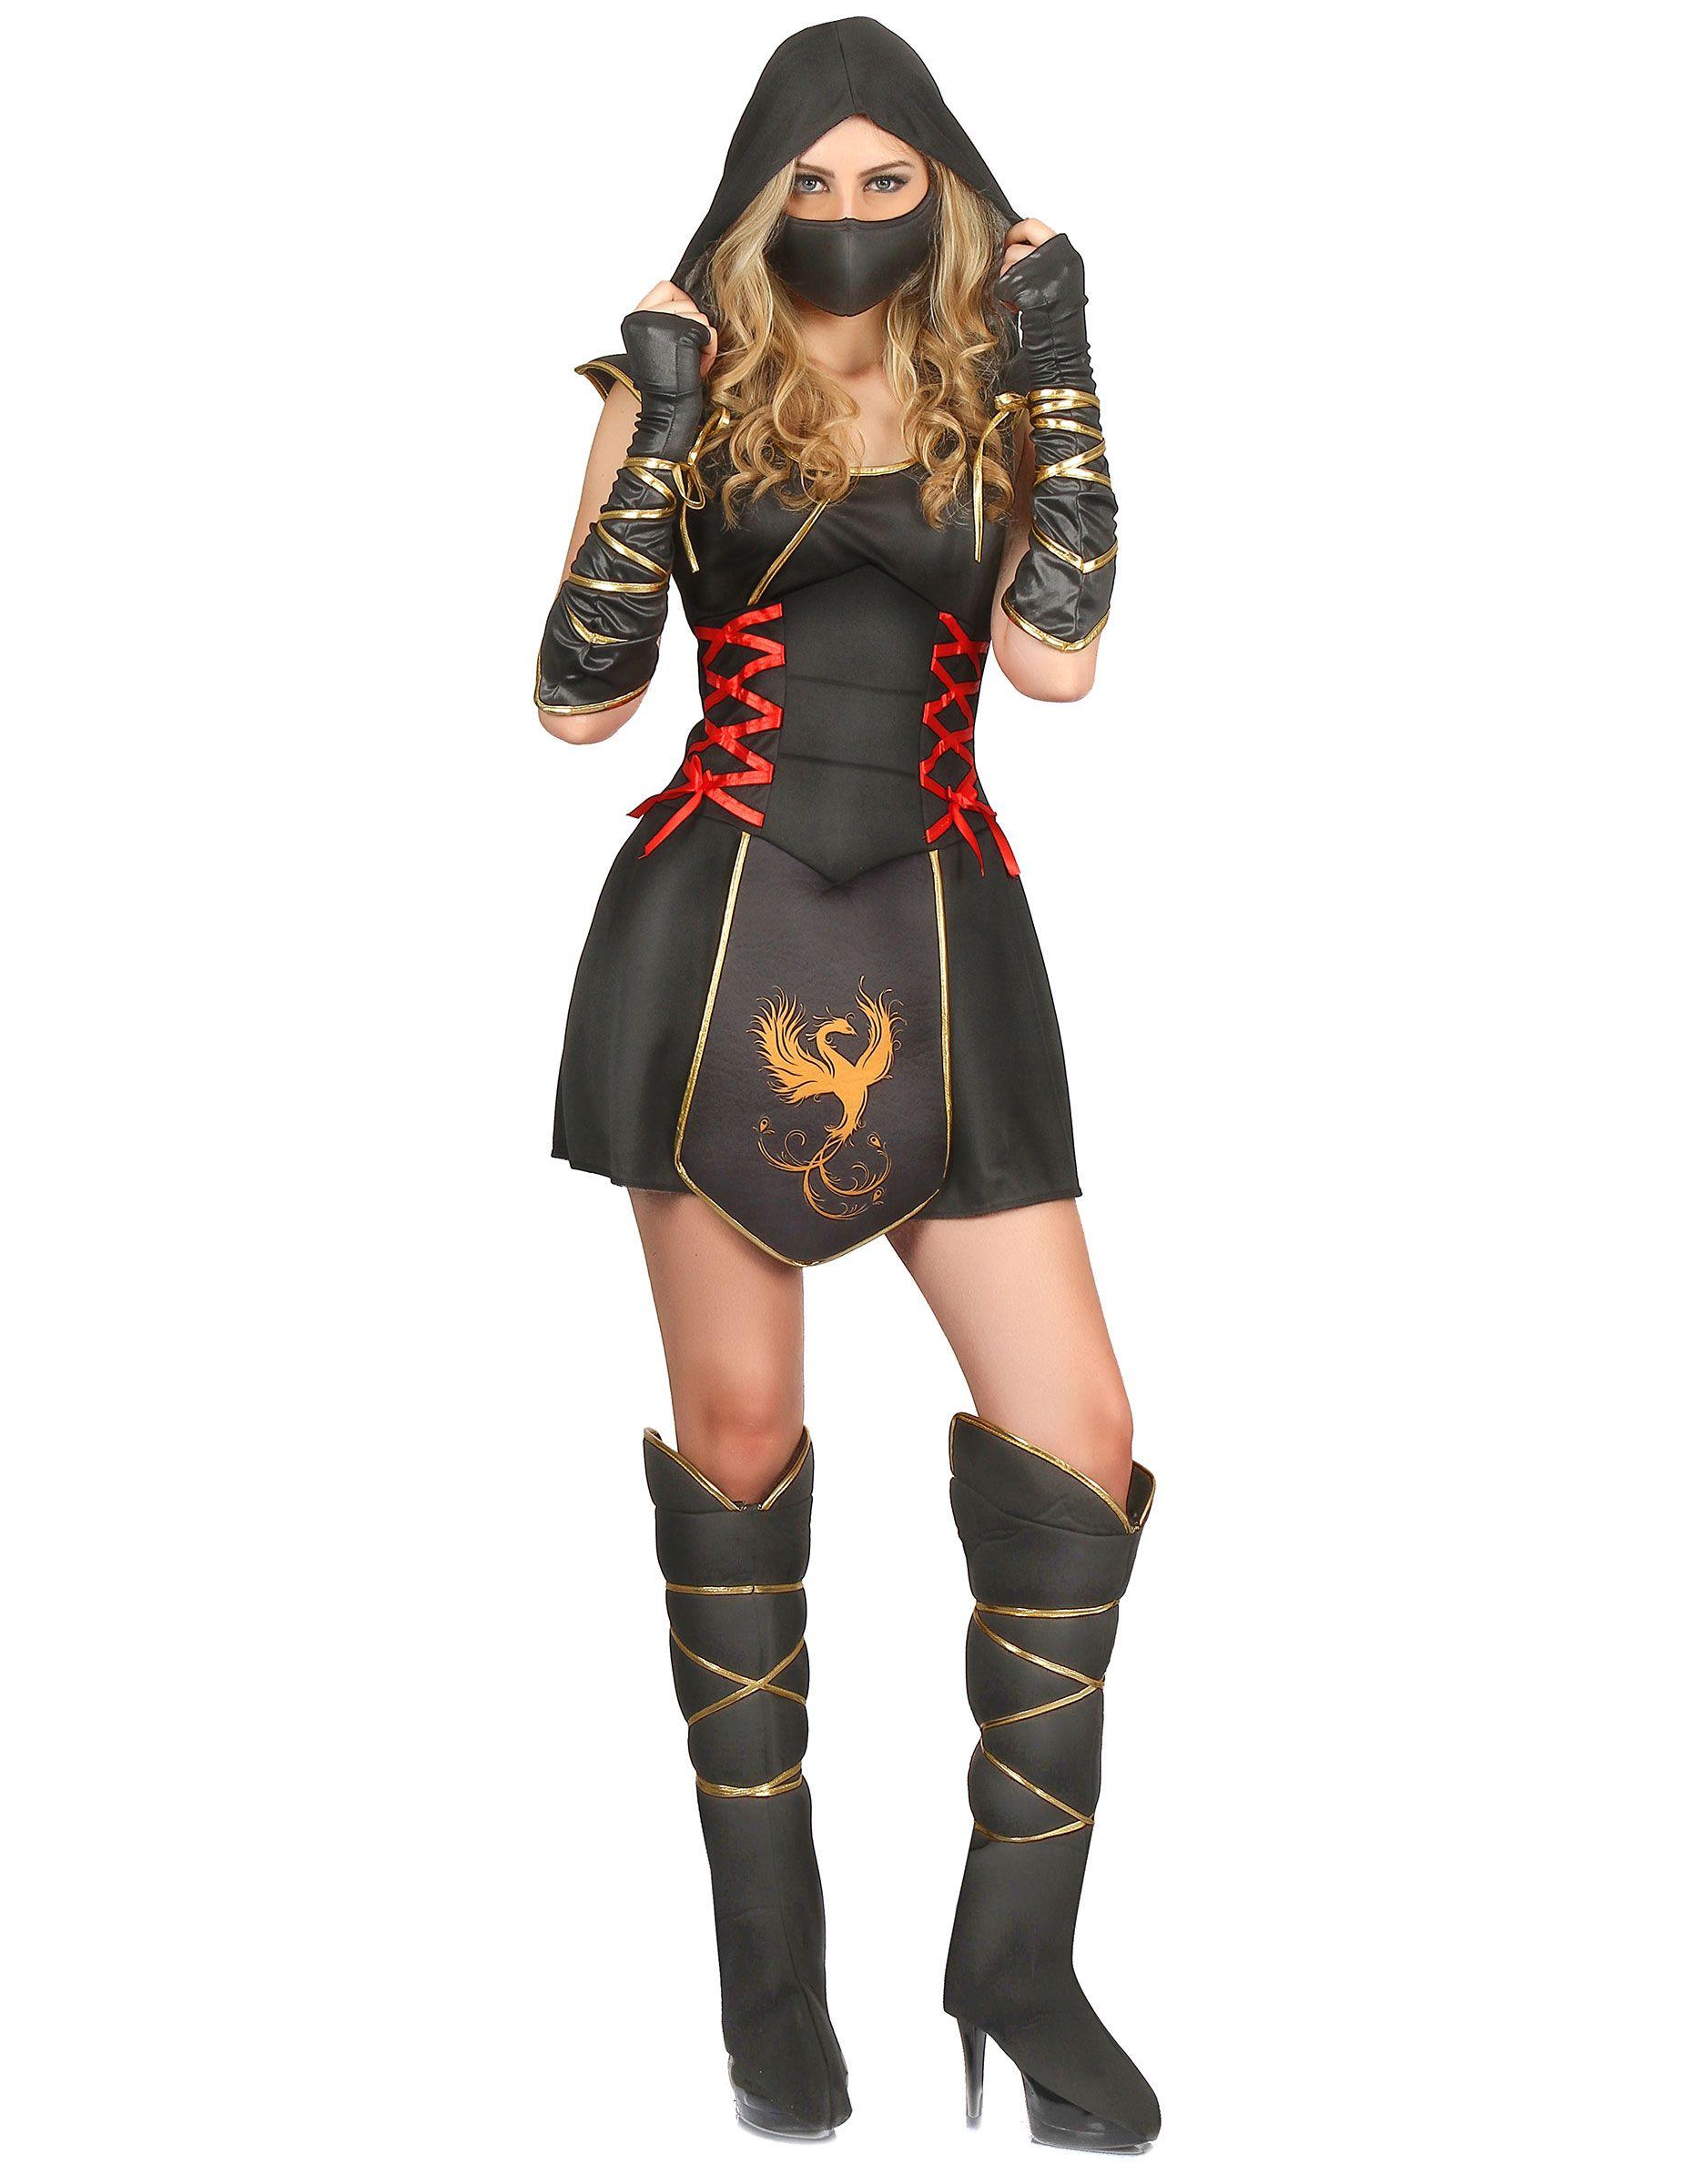 76573b87d Disfraz ninja para mujer guerrera | Disfraces Halloween | Disfraz de ...